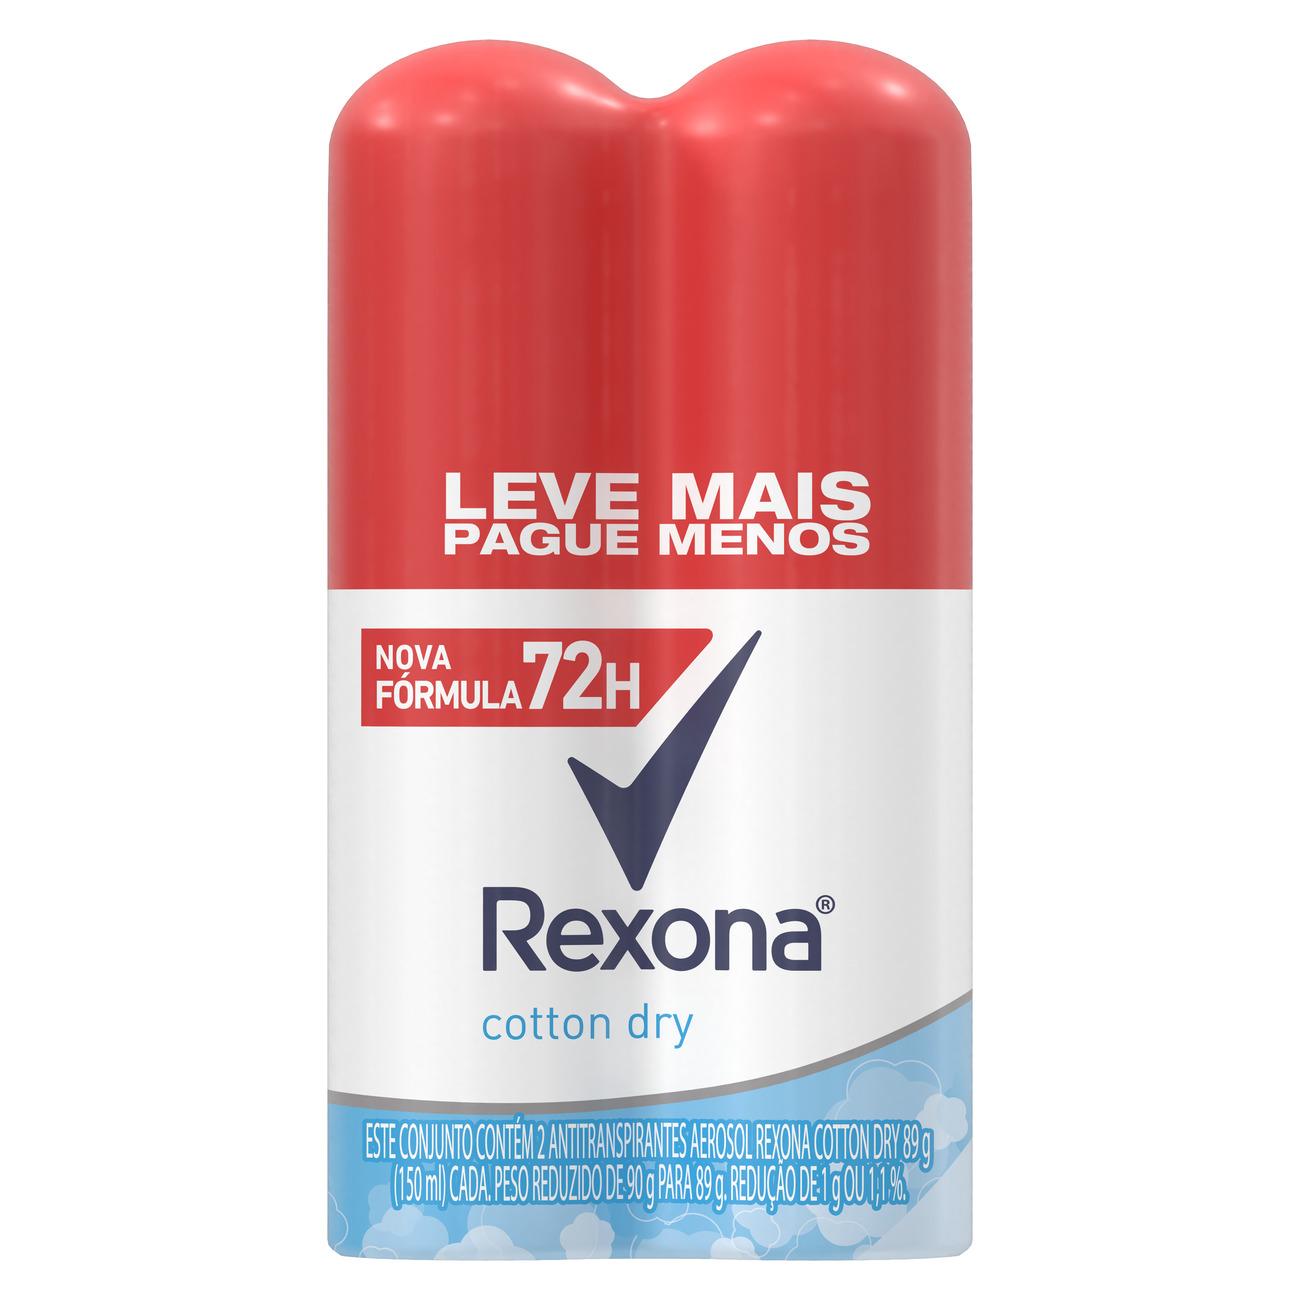 Oferta 2 Desodorantes Antitranspirantes Rexona Cotton Dry 72 horas 150mL